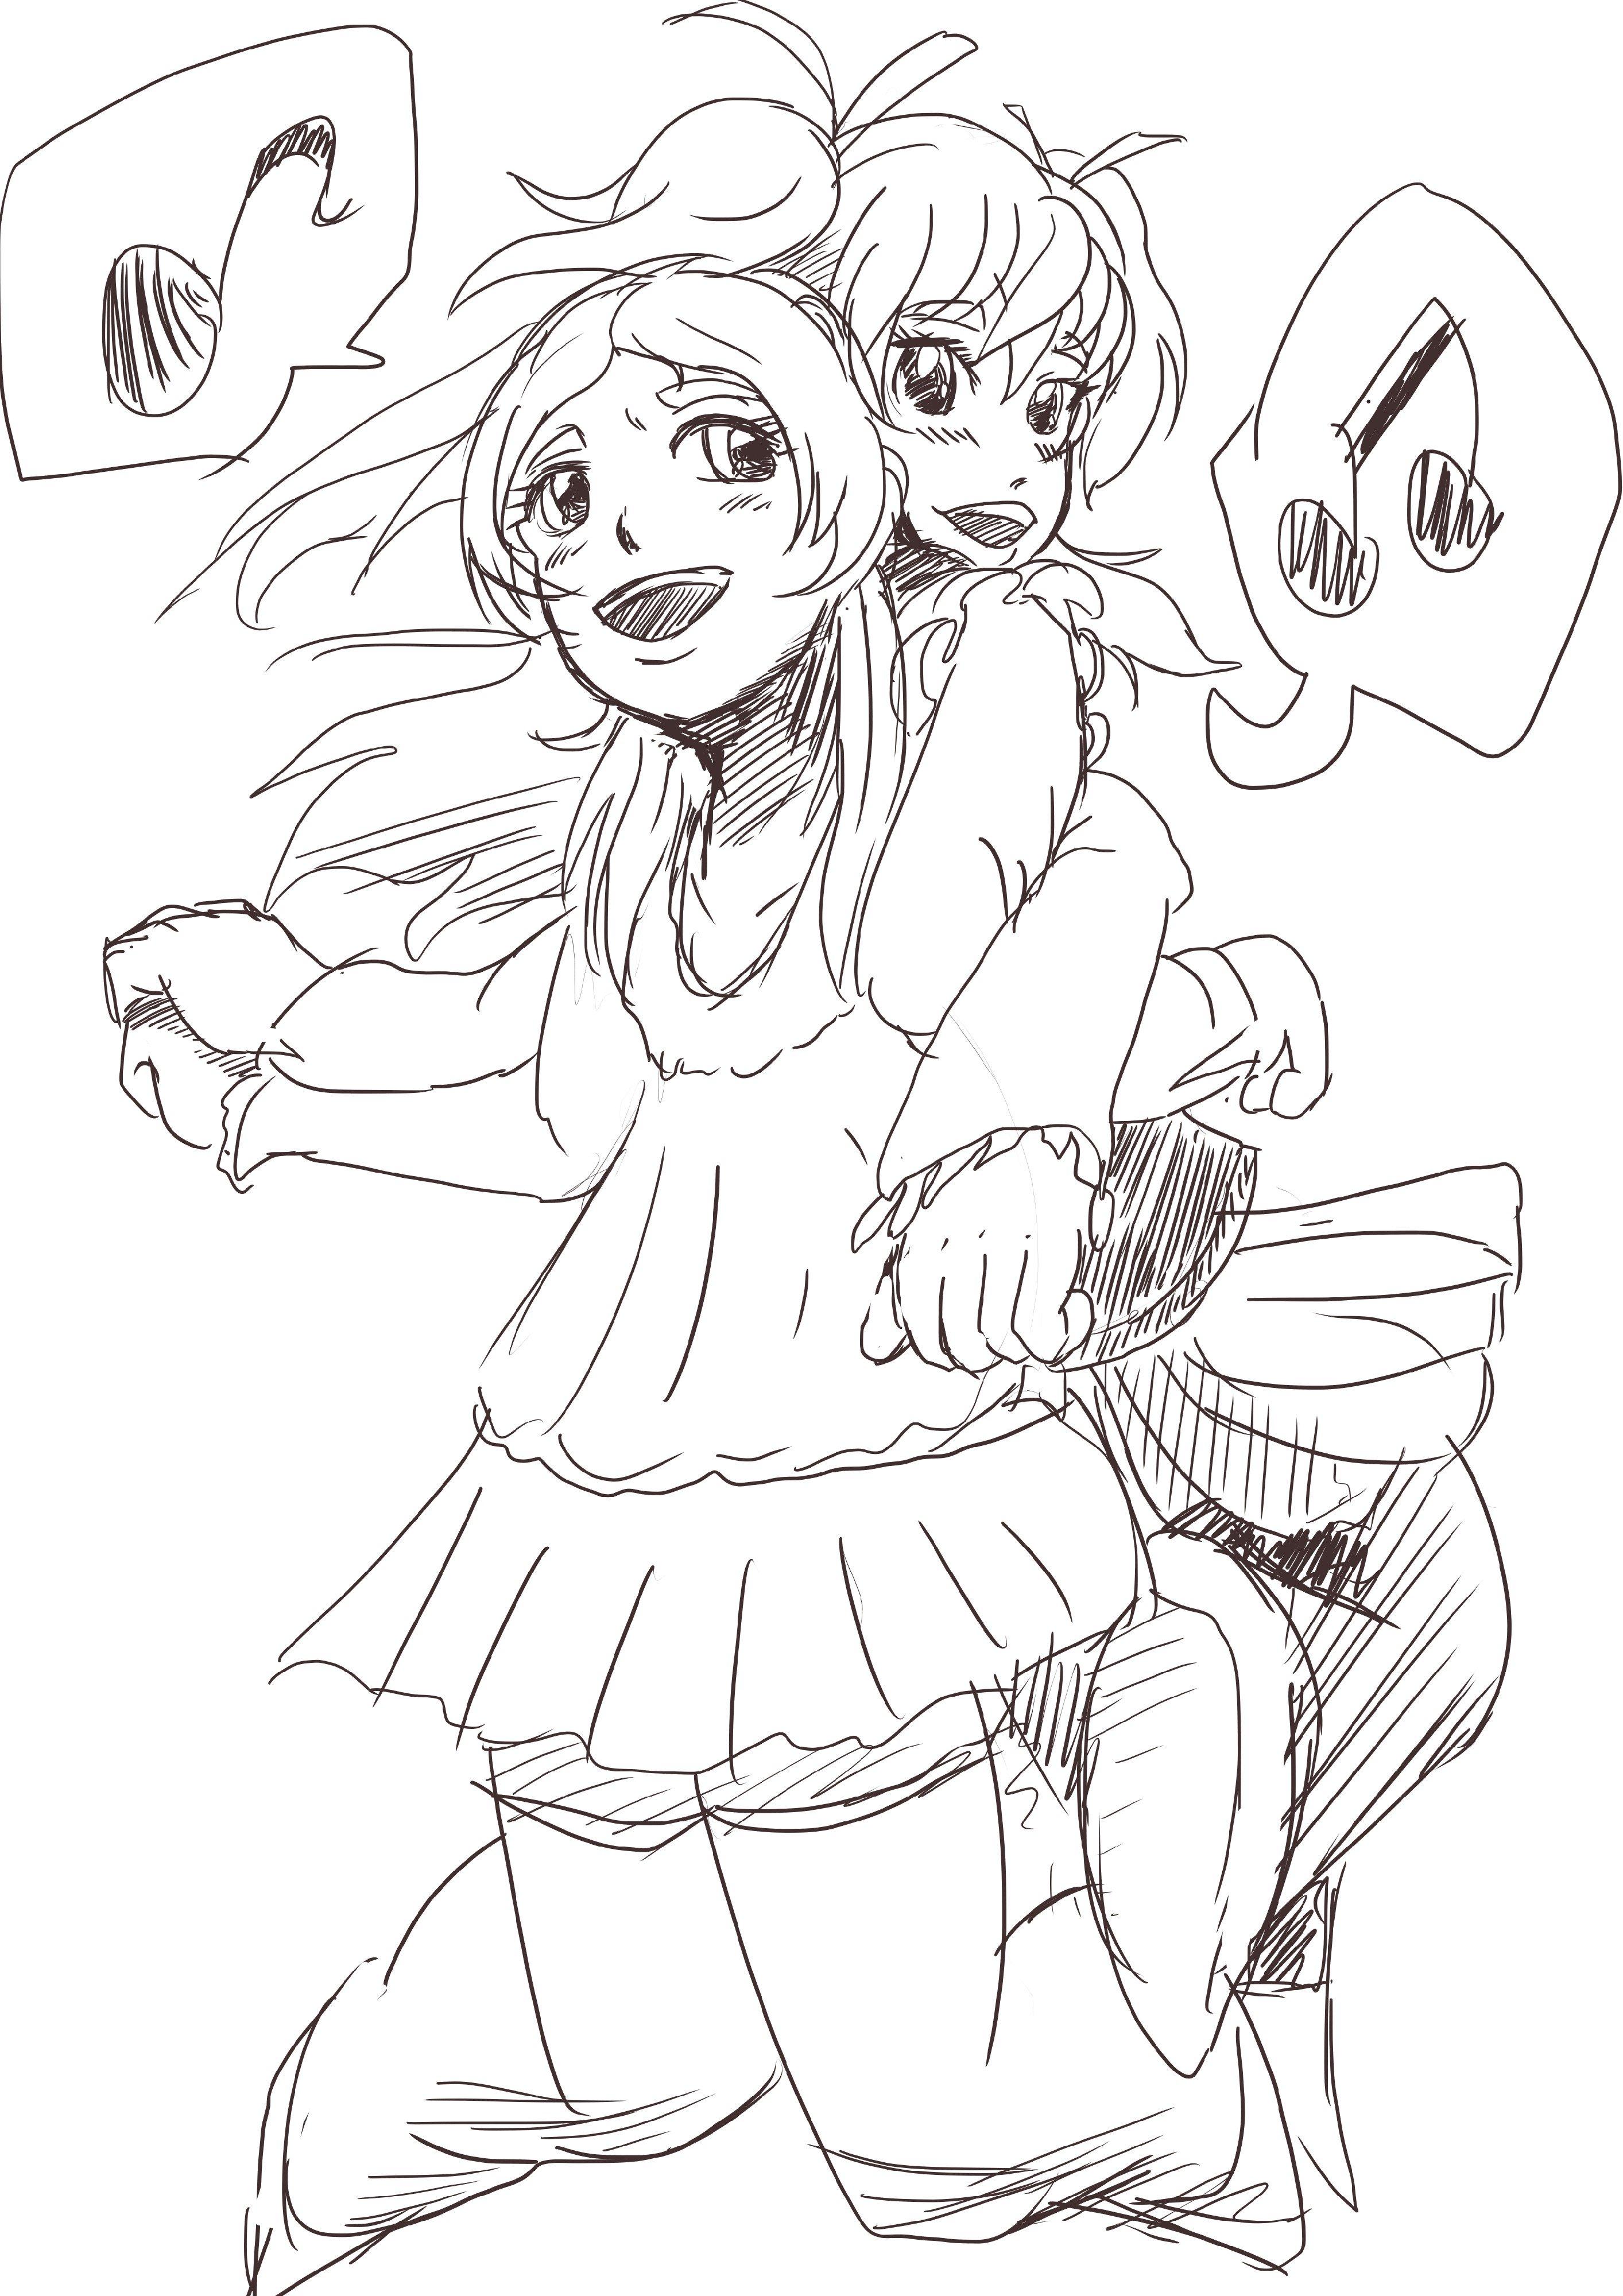 mamepotato@お絵描き版 (@mamepotato2)さんのイラスト